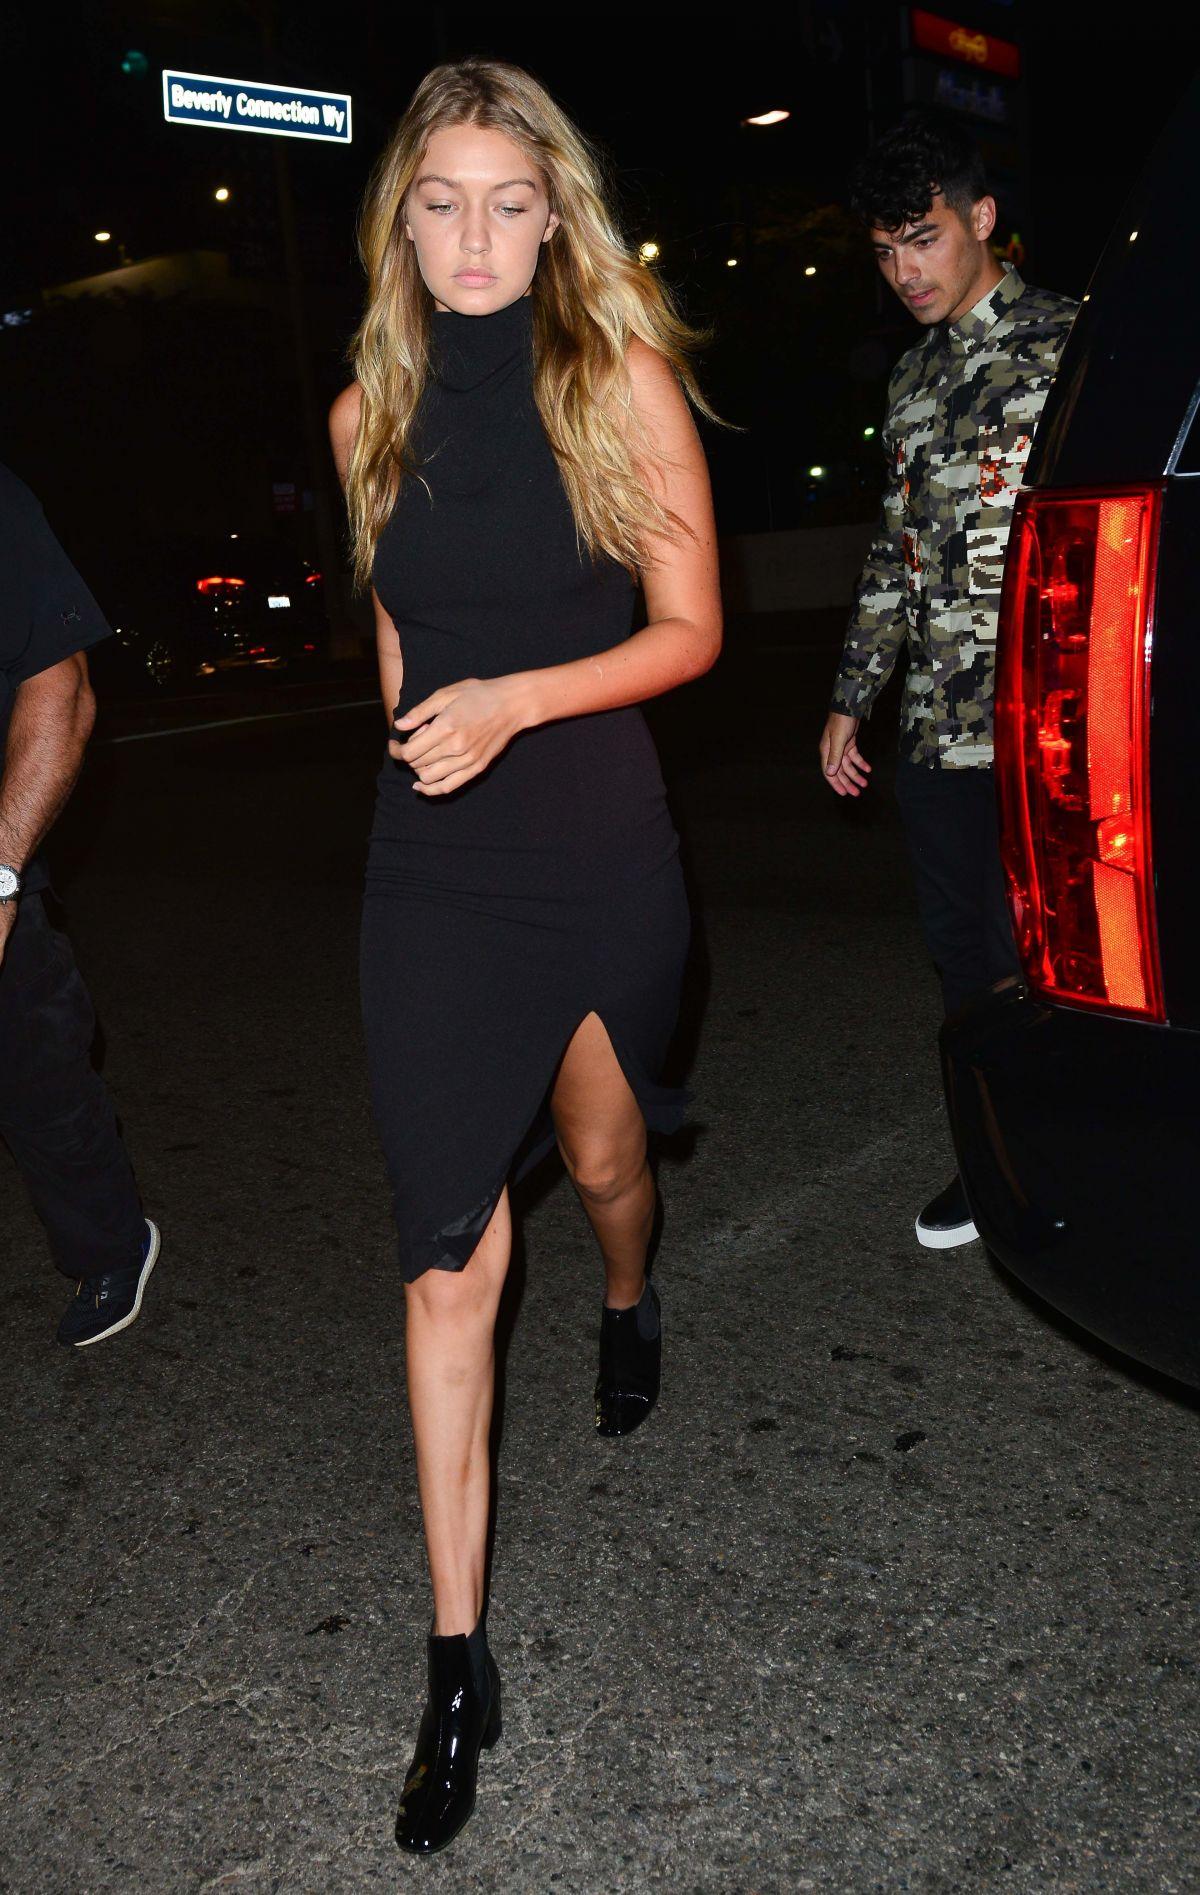 GIGI HADID Night Out in Hollywood 08/29/2015